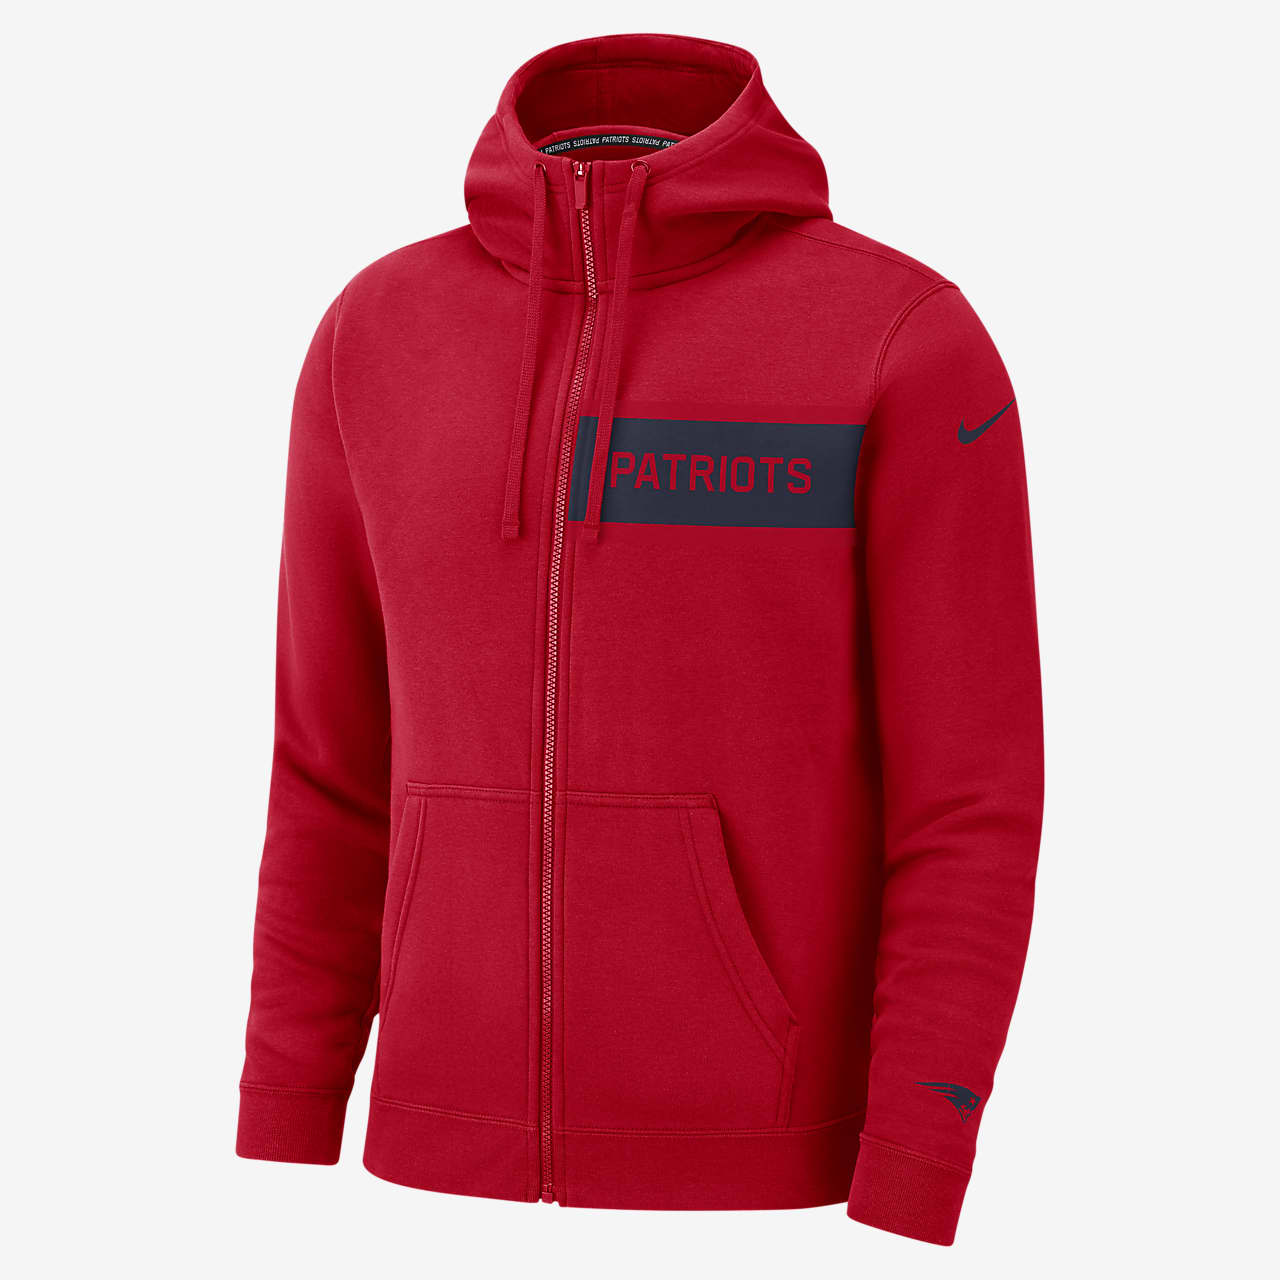 Nike (NFL Patriots) Men's Club Fleece